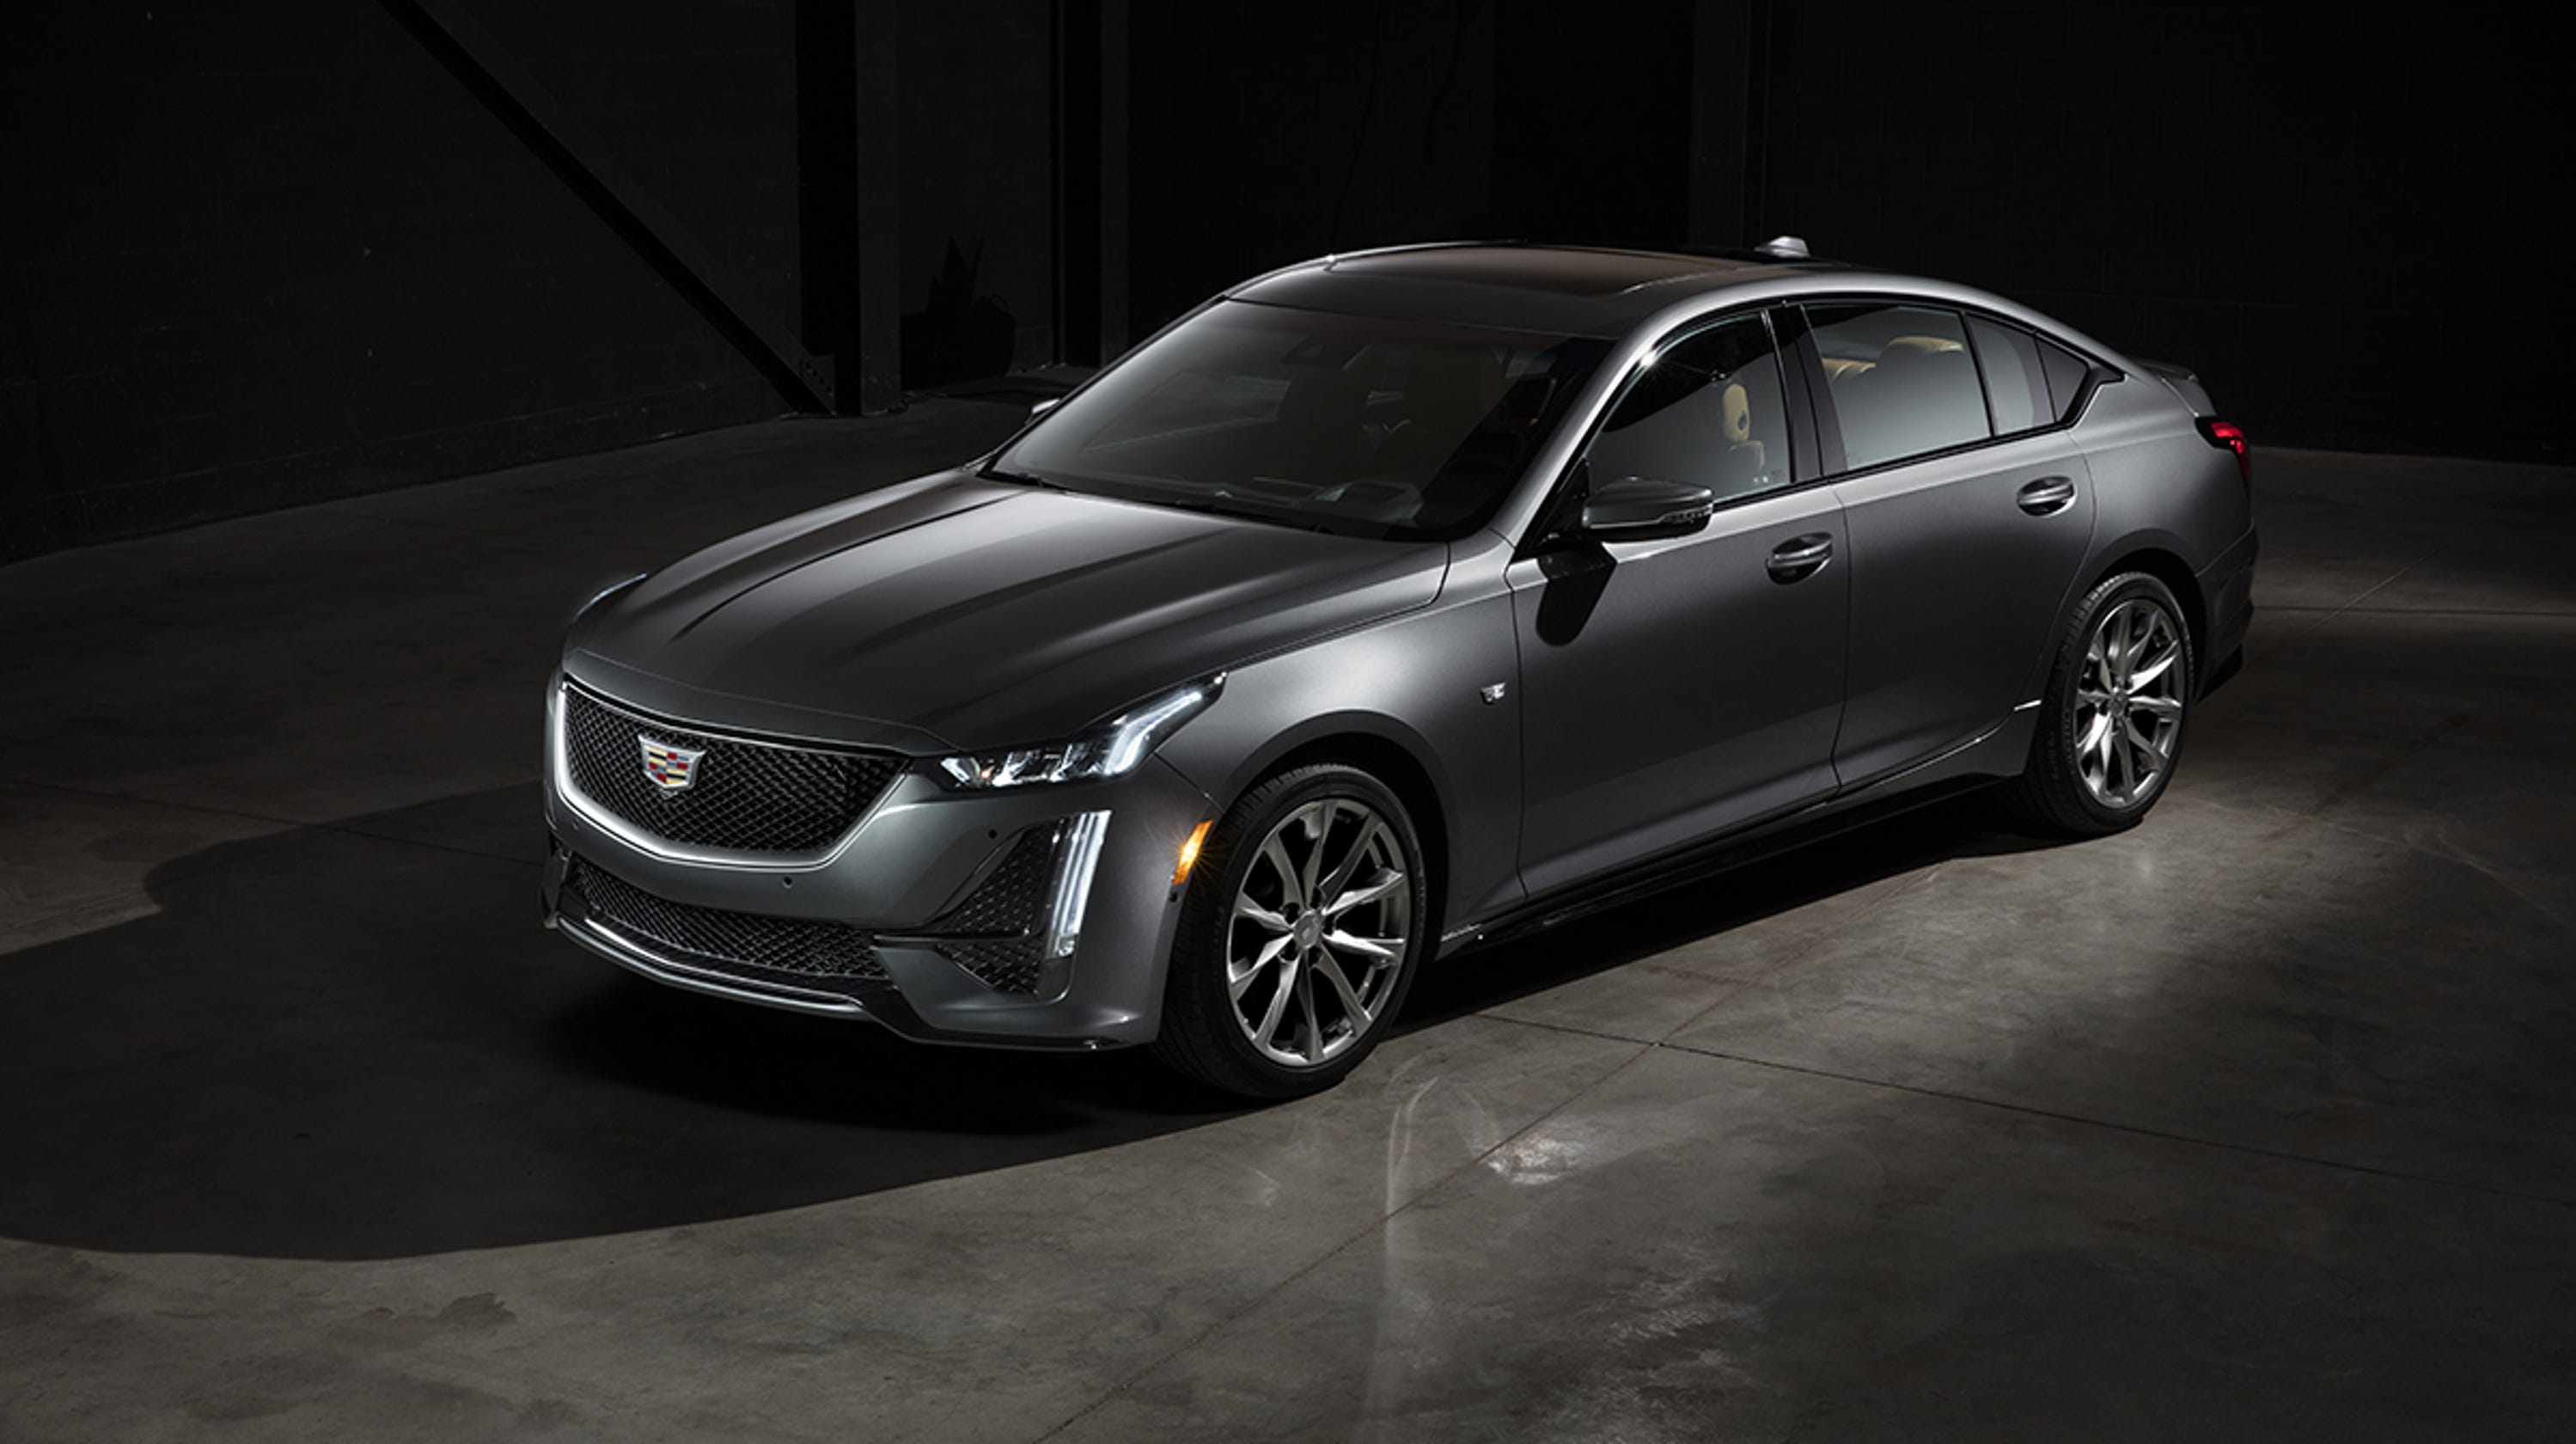 Cadillac CT5 reveal on social media bucks SUV trend